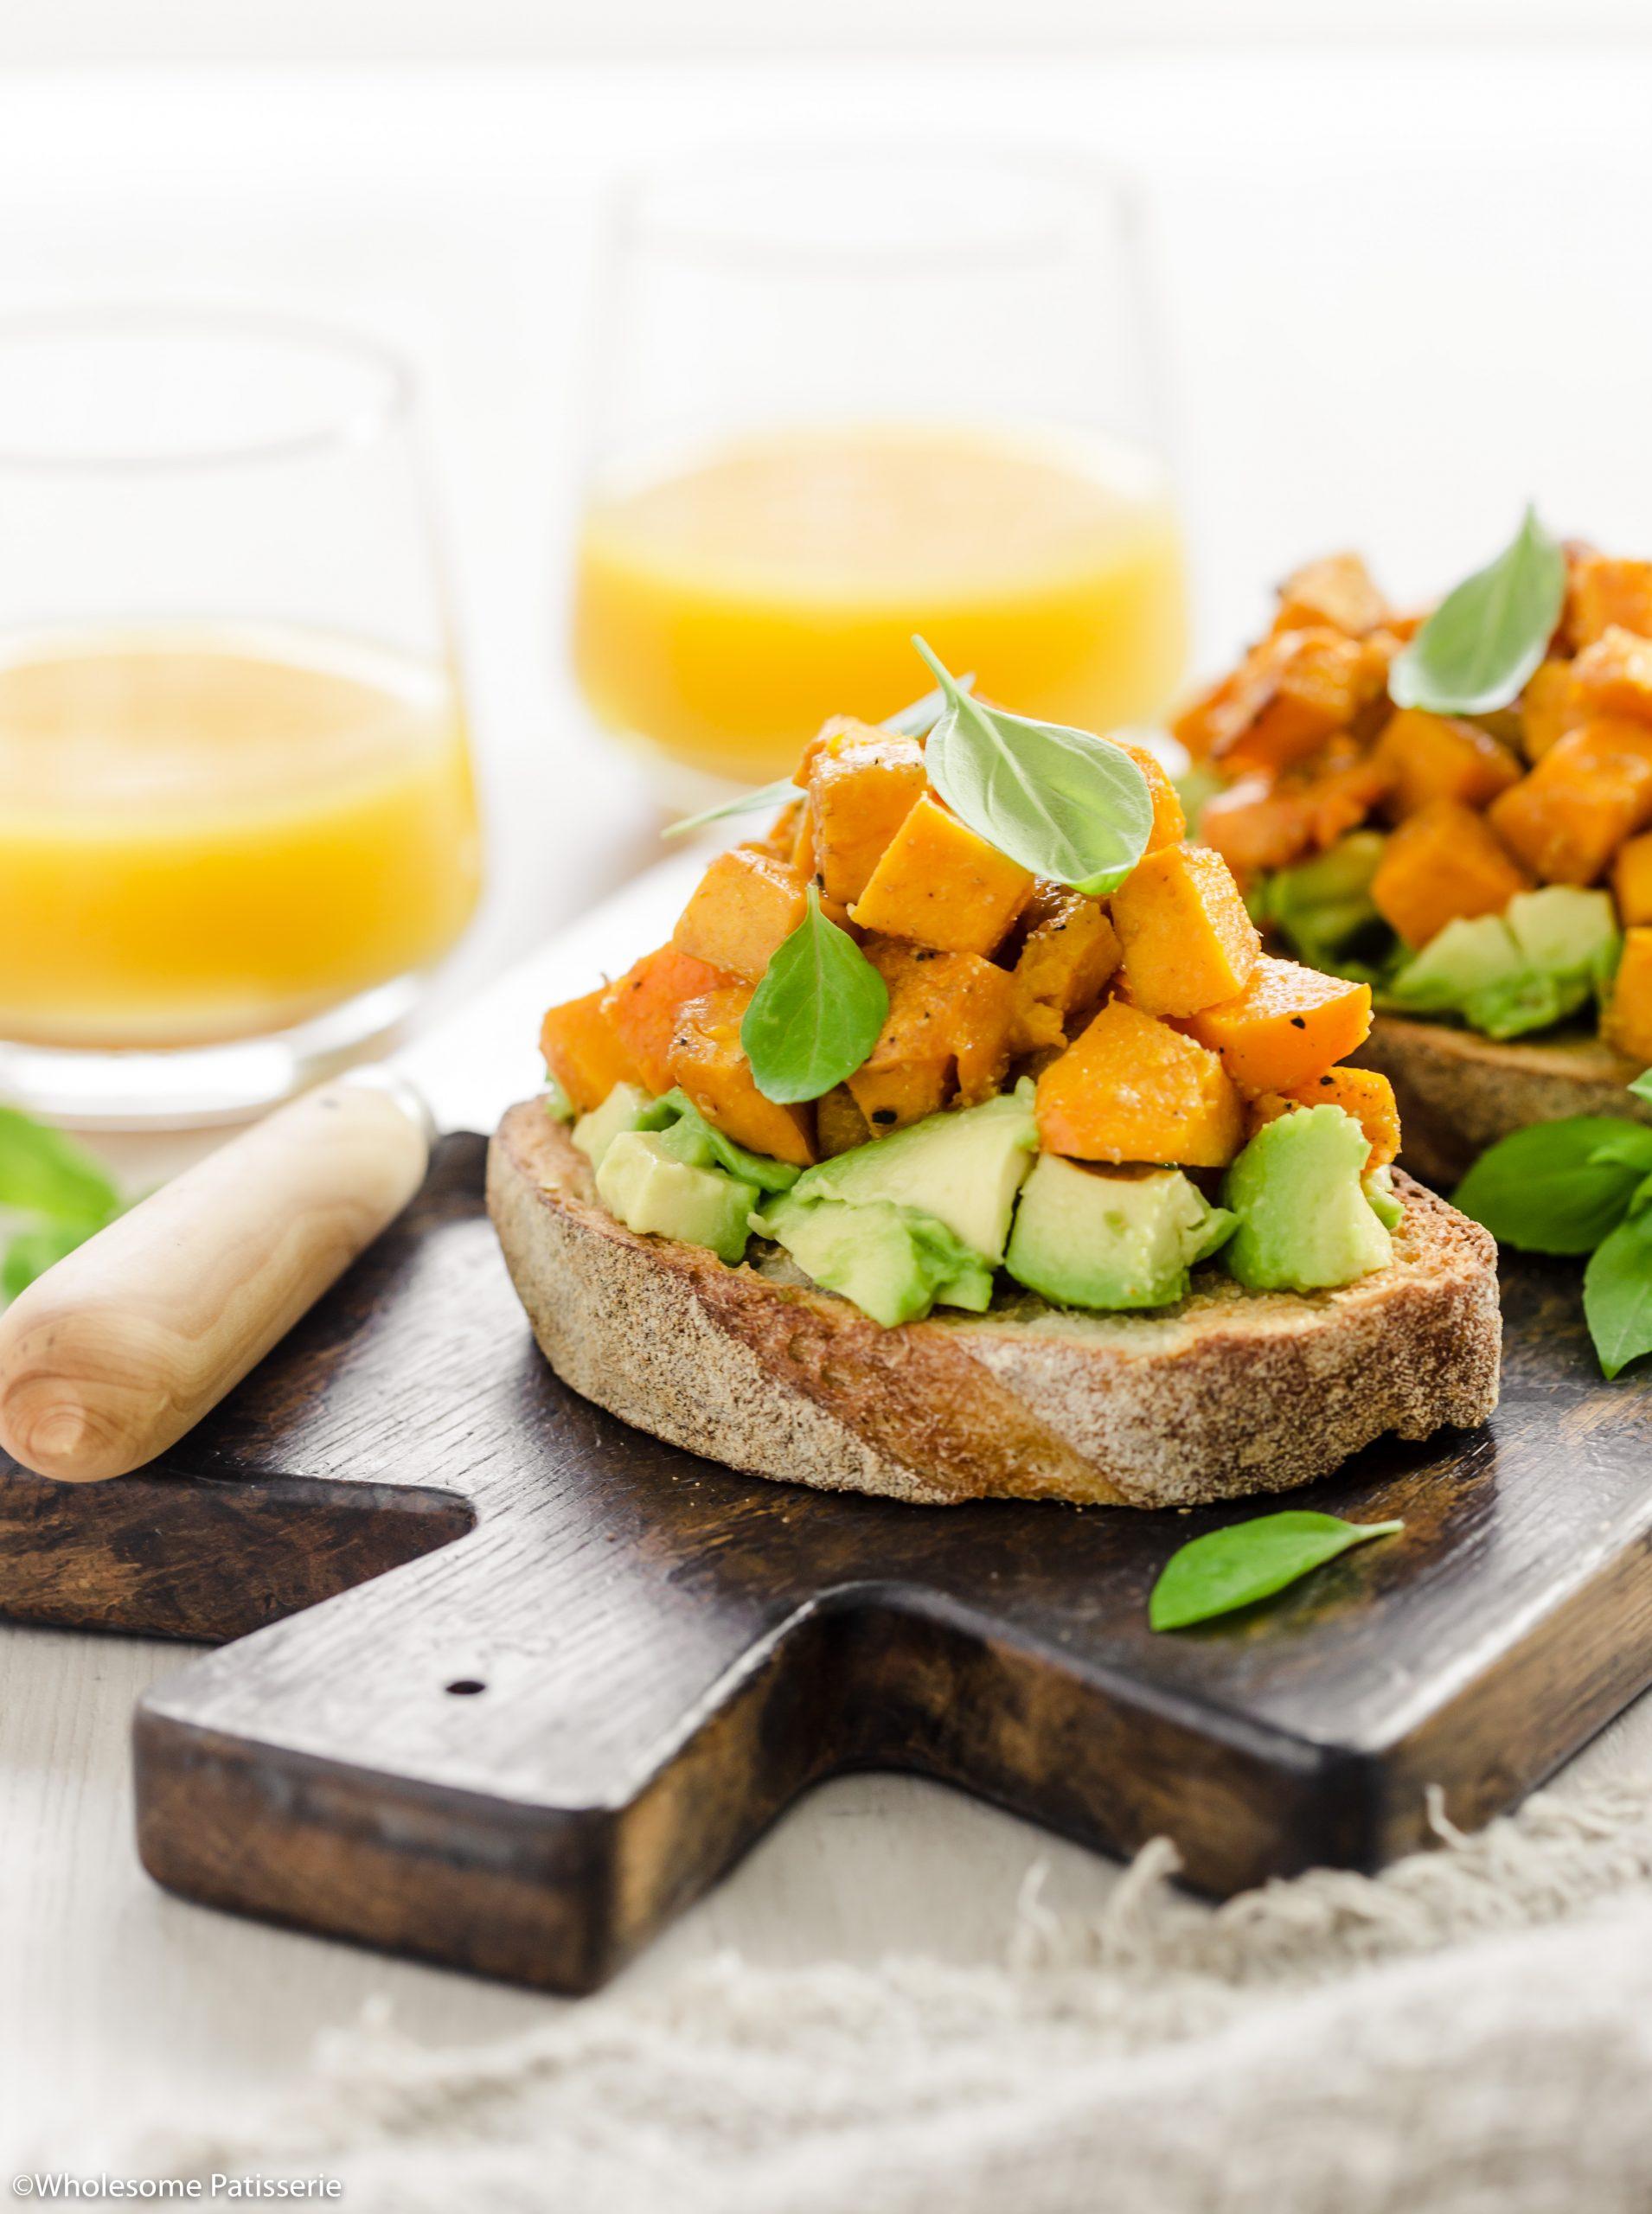 Roasted Pumpkin & Avocado Bruschetta